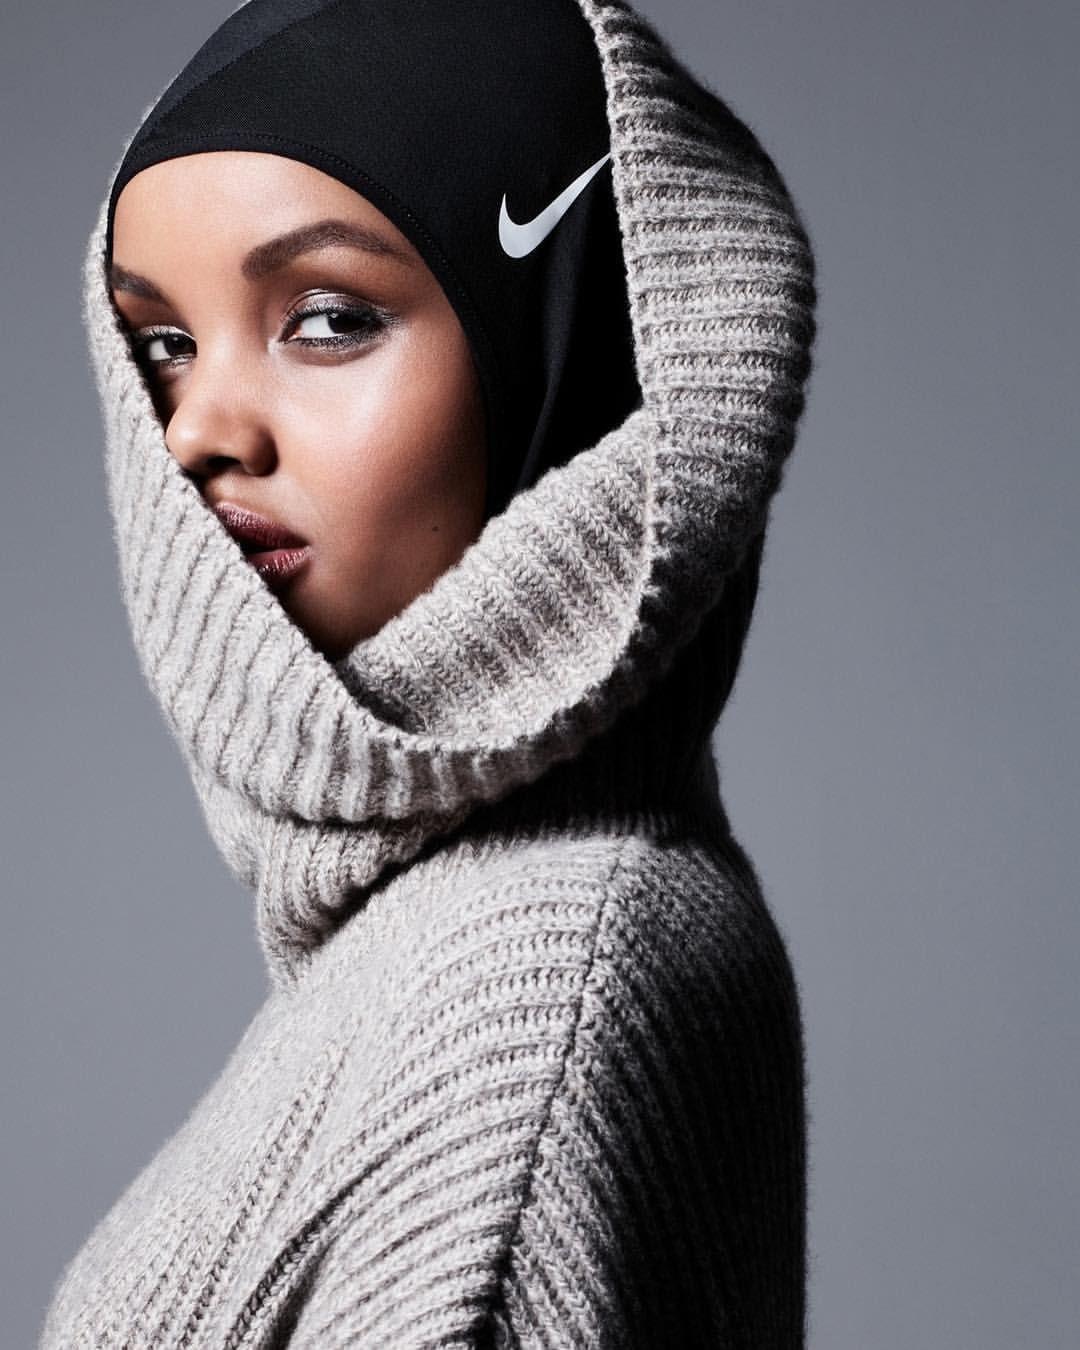 Halima Aden Nike, Hijabi Supermodel, Hijab-Wearing Model, Muslim Vogue Model, Muslim Model